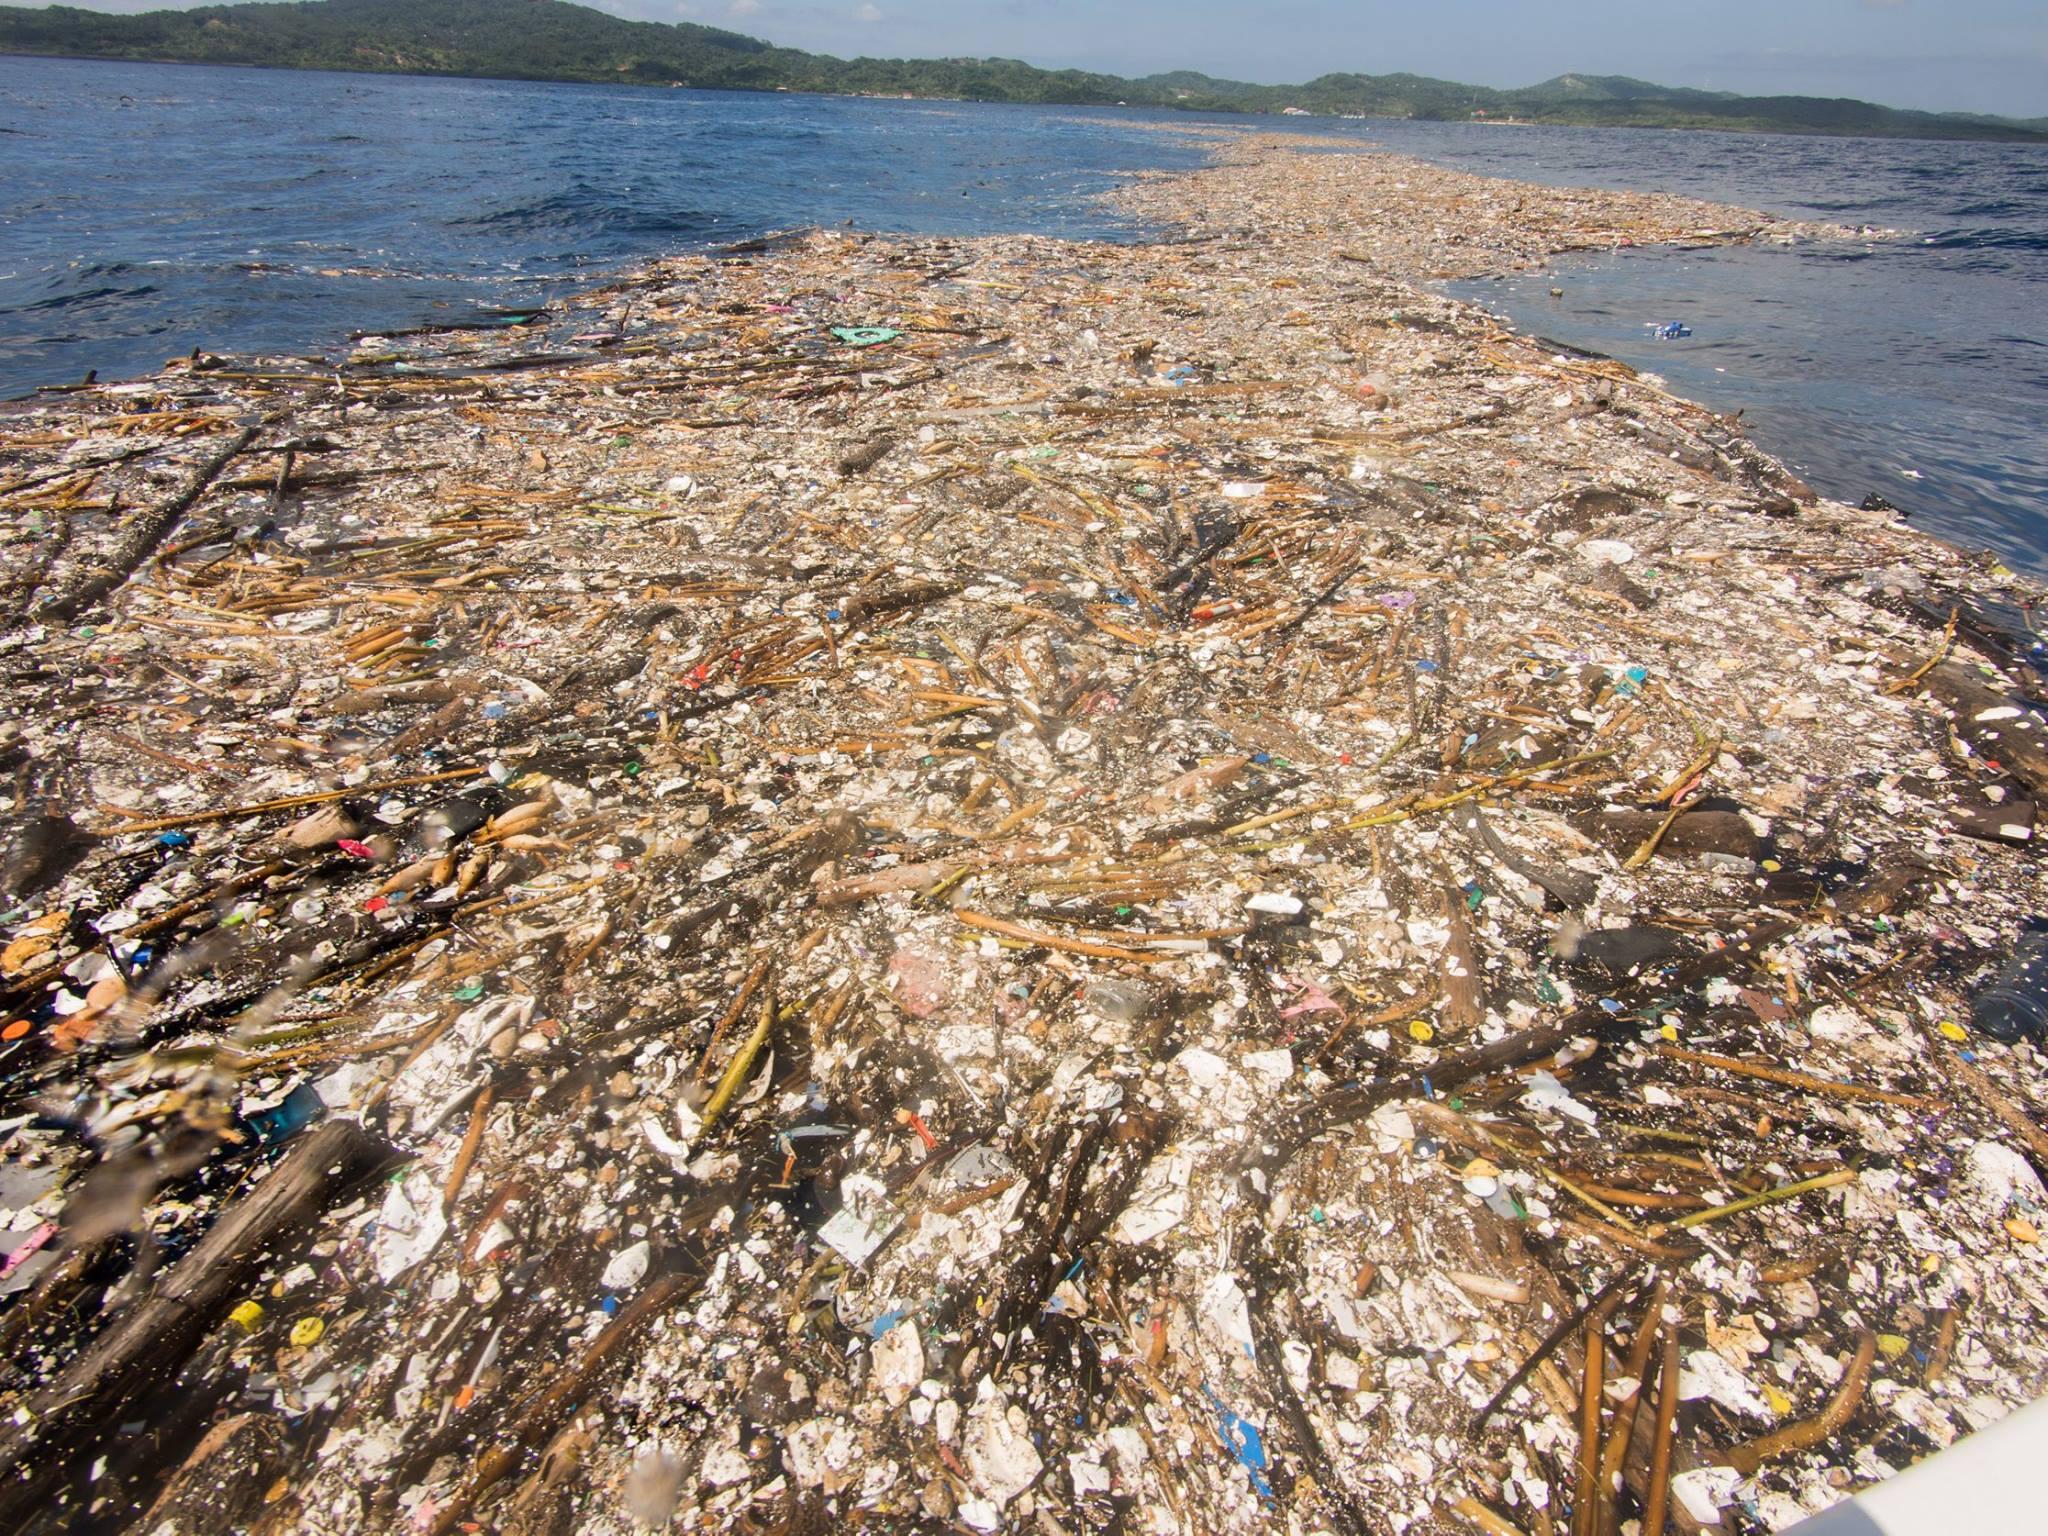 Plastic waste floats off the coast of Roatan, Honduras on September 7, 2017.